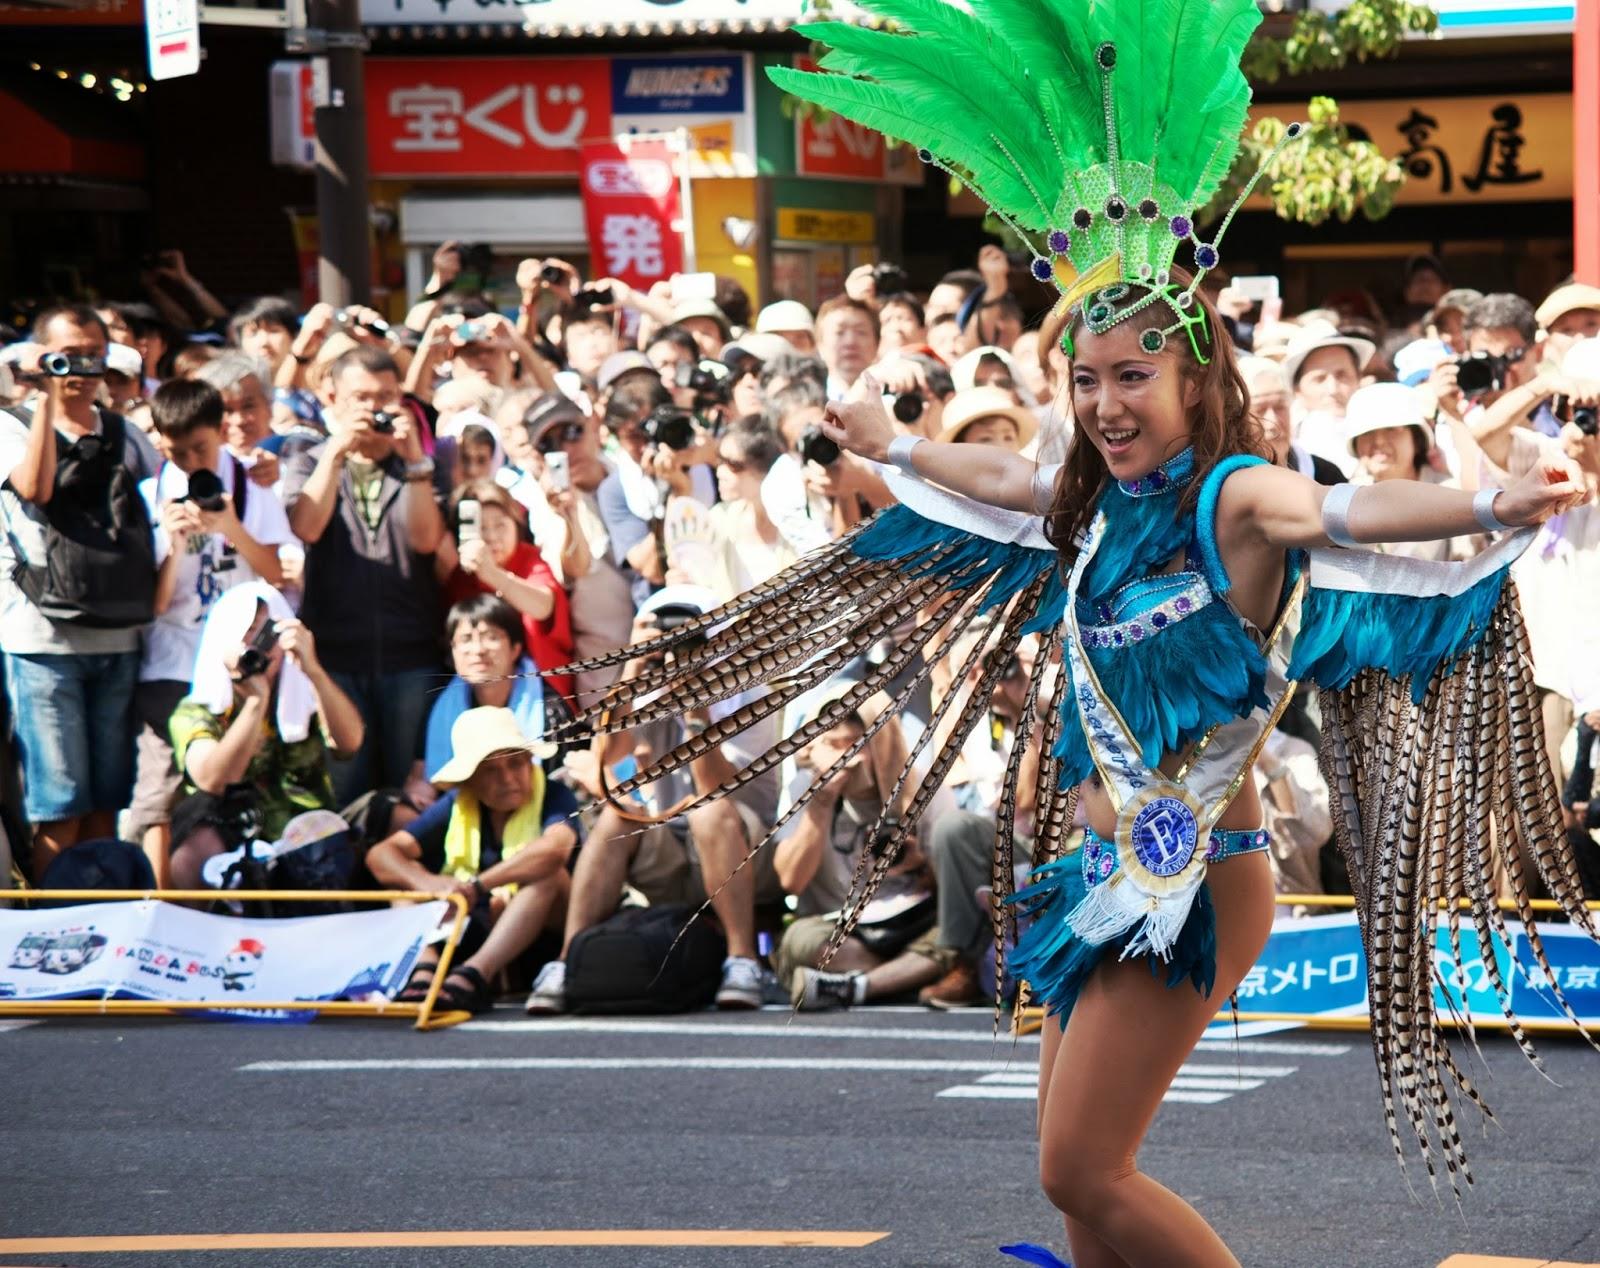 The Asakusa Samba Carnival 2013